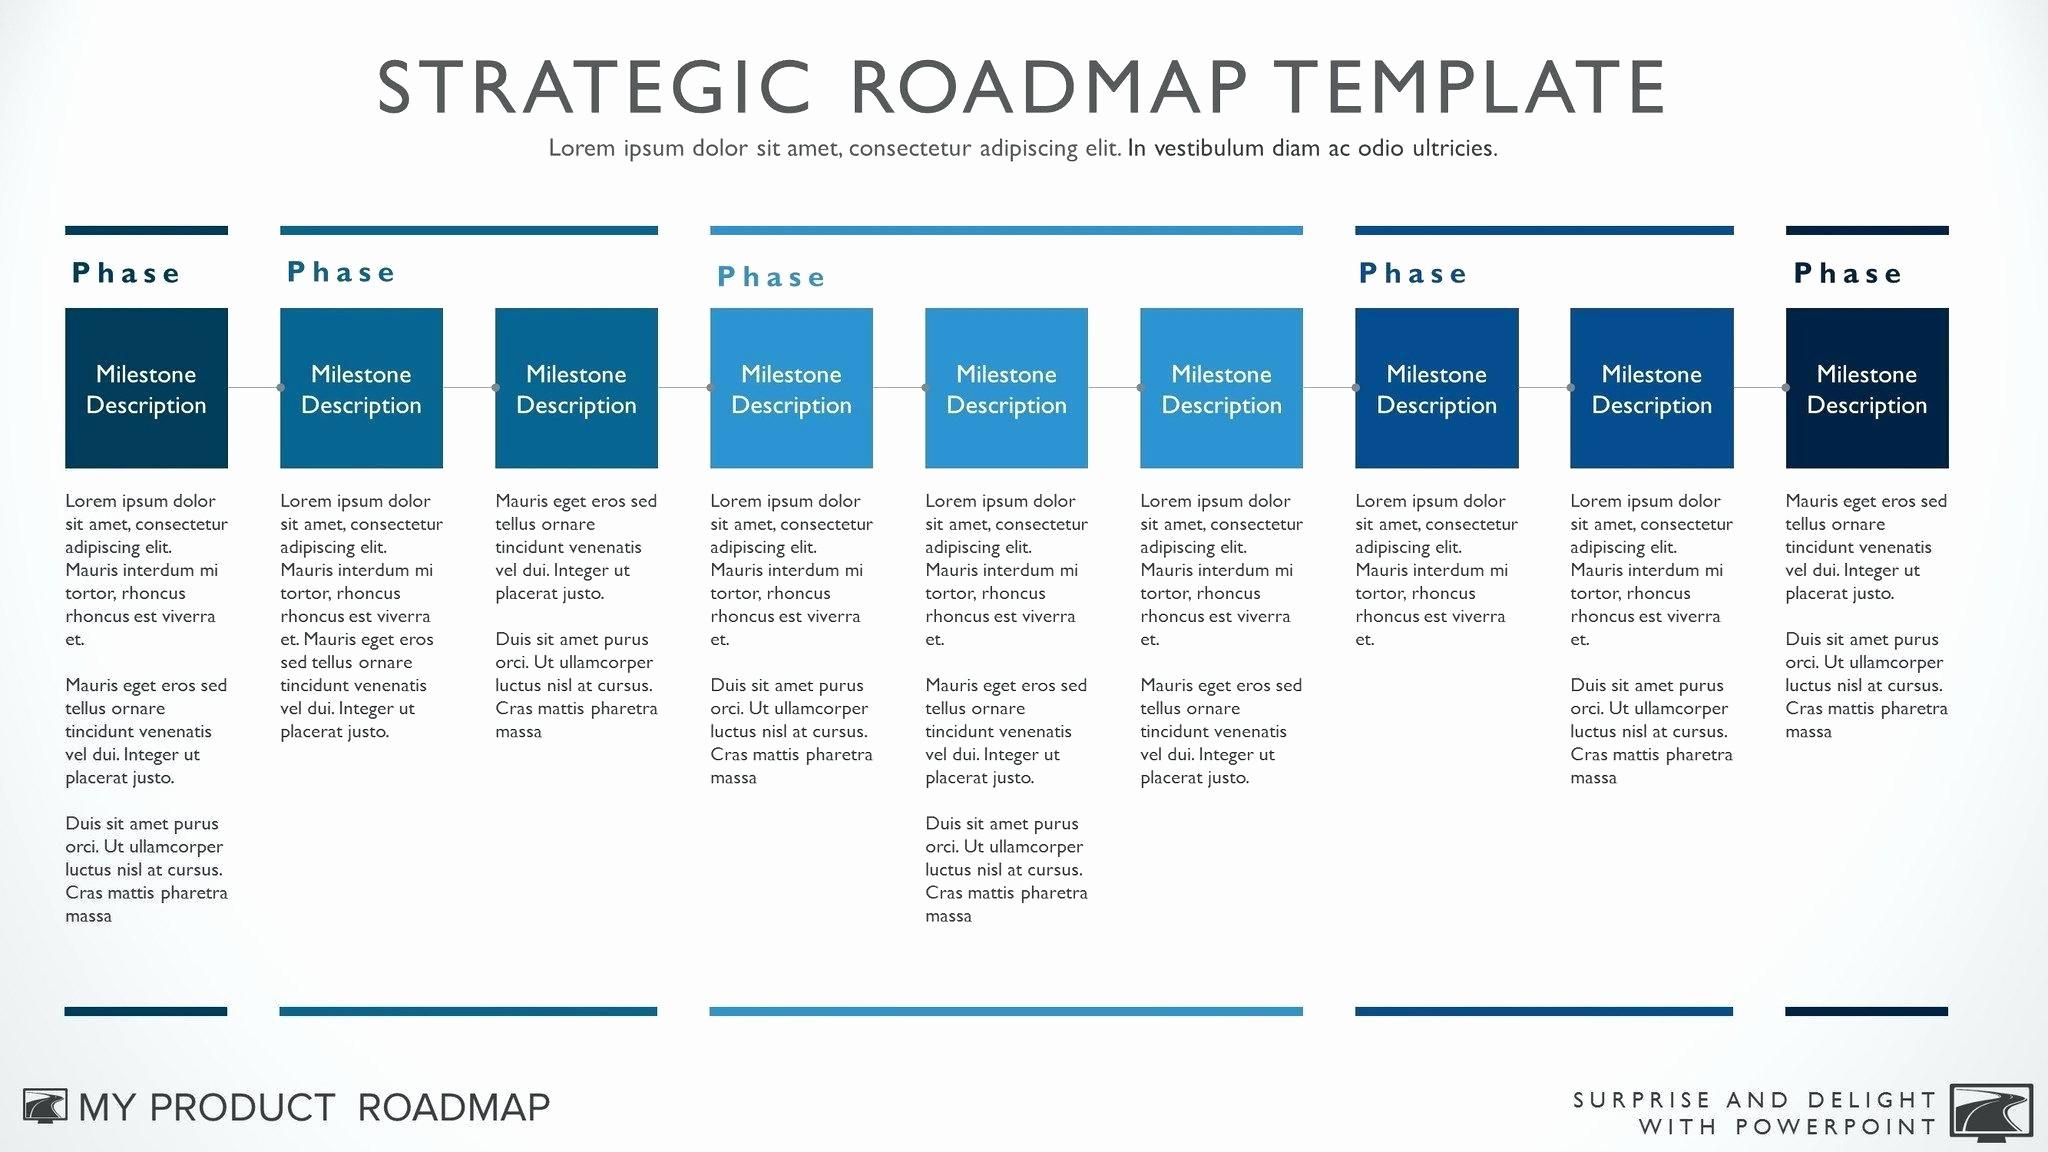 Milestone Plan Template In Excel Best Of Template Milestone Plan Template